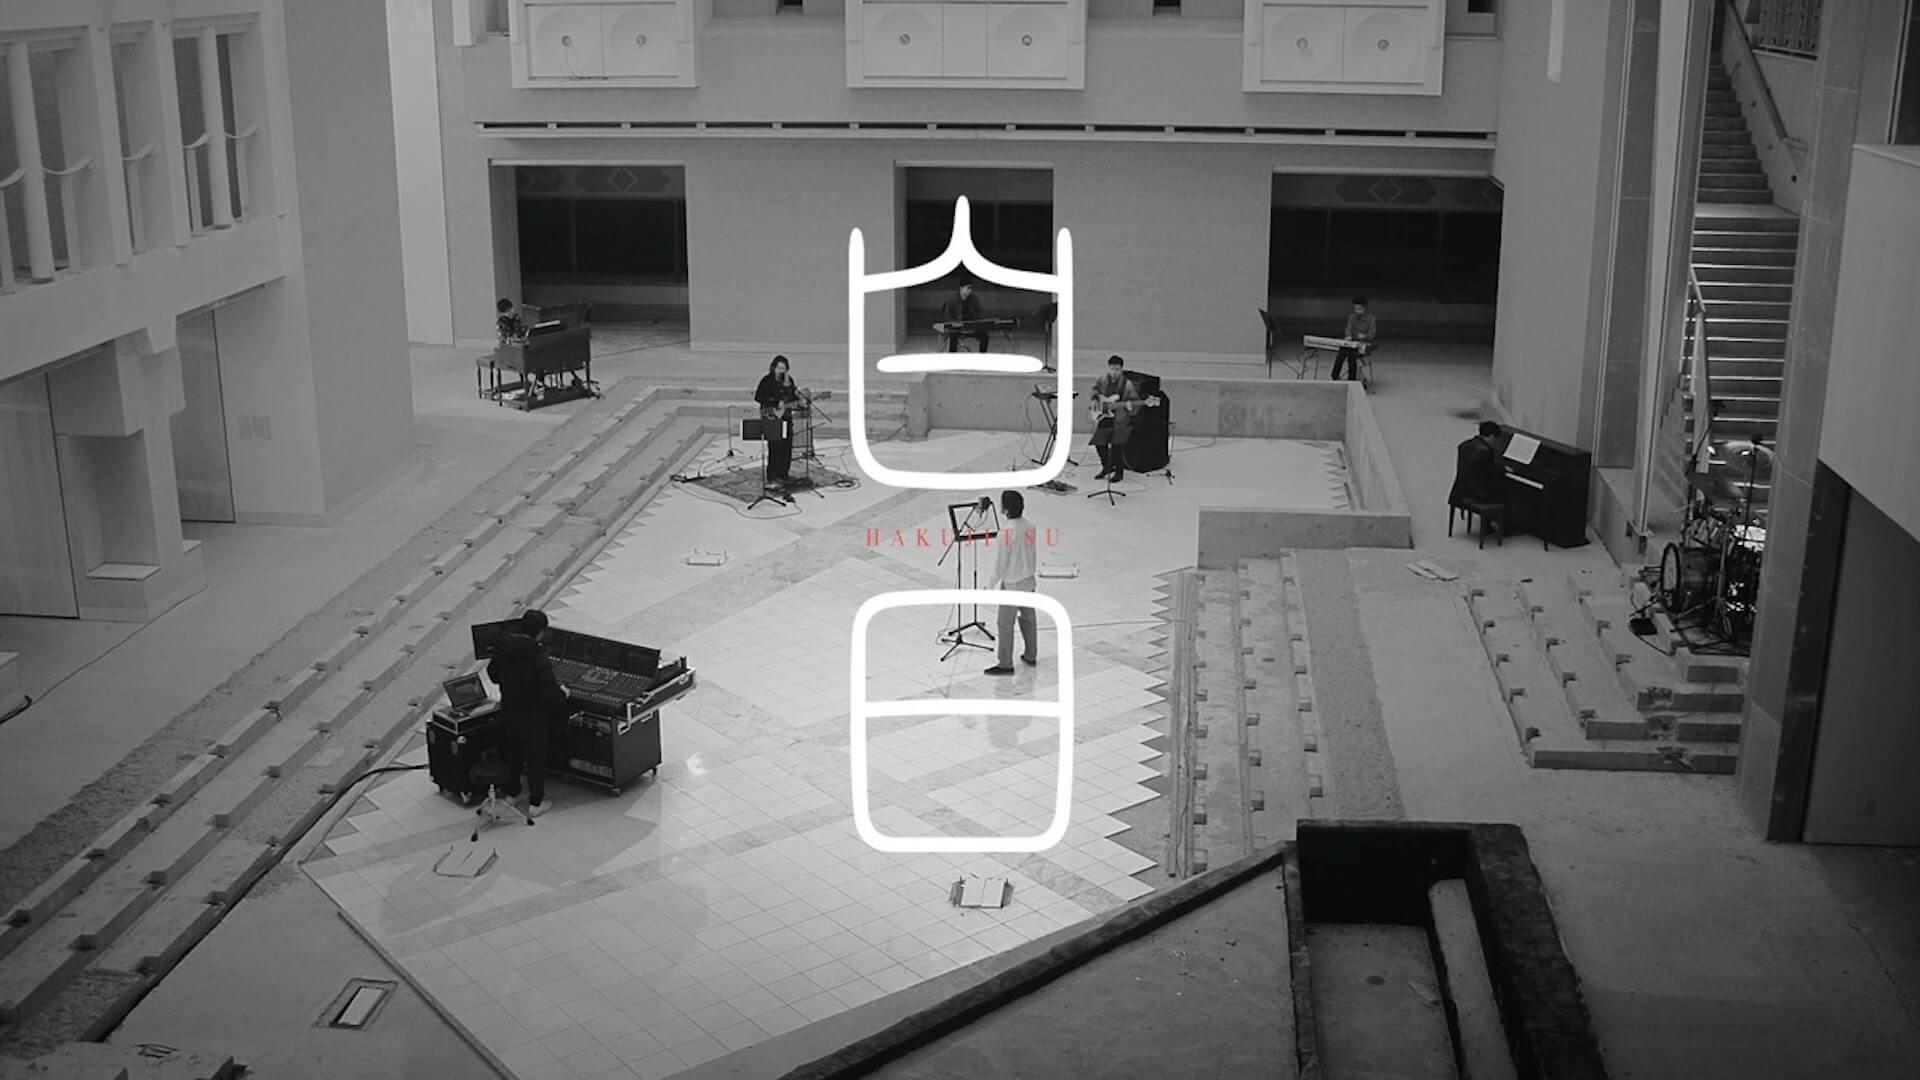 『NHK紅白歌合戦』にも出場するKing Gnu大ヒット曲「白日」MVがYouTube再生回数1億回突破! music191212_kinggnu_hakujitsu_4